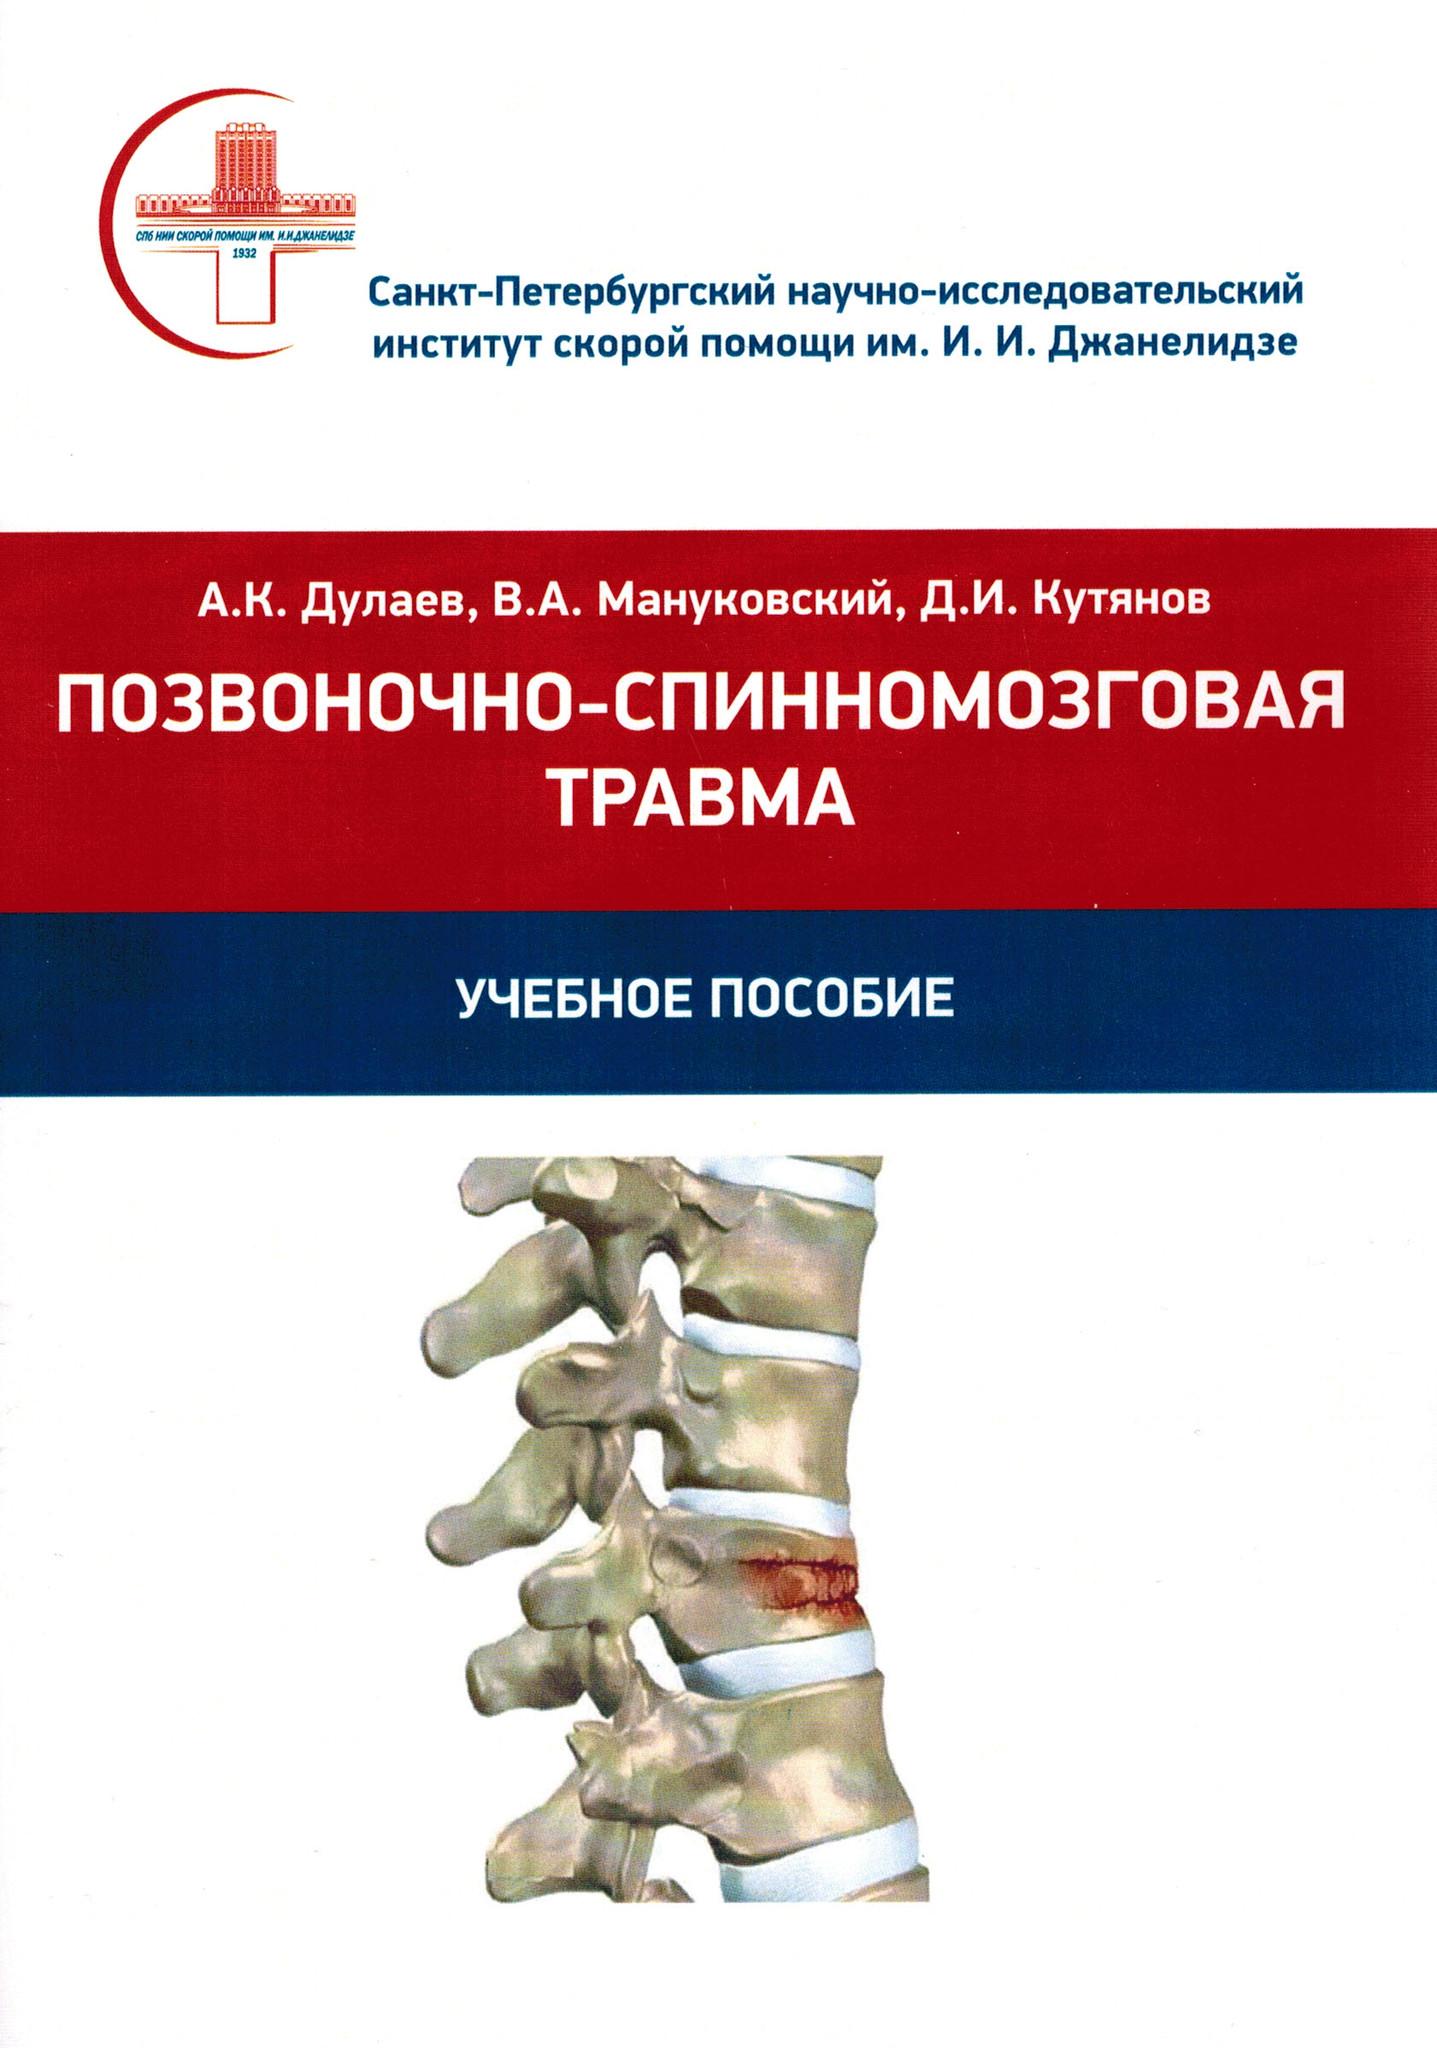 Каталог Позвоночно-спинномозговая травма pst.jpg